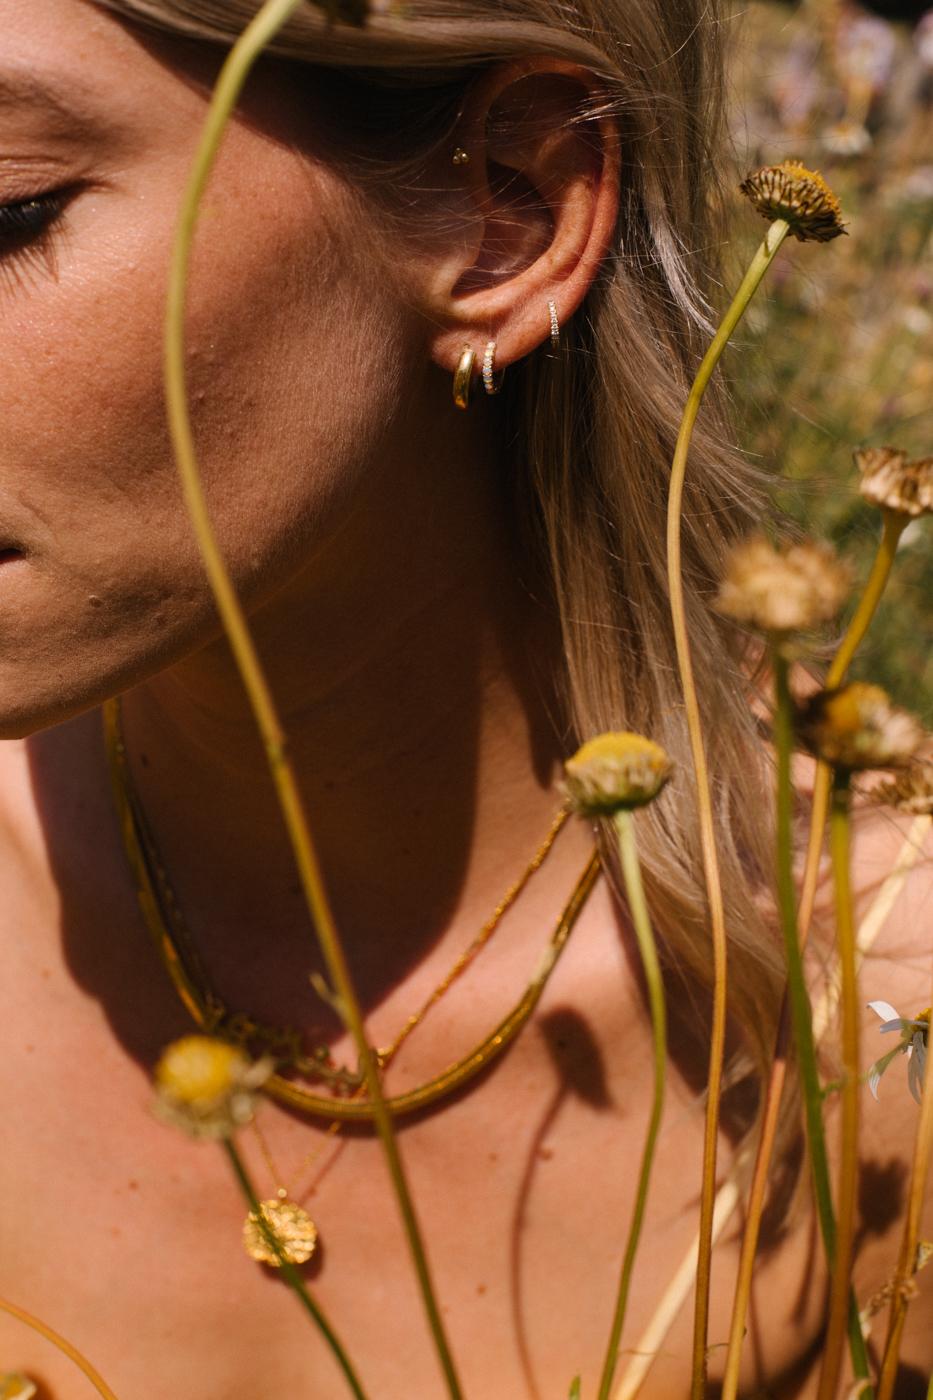 Jewellery-Ropes-of-holland-10.jpg